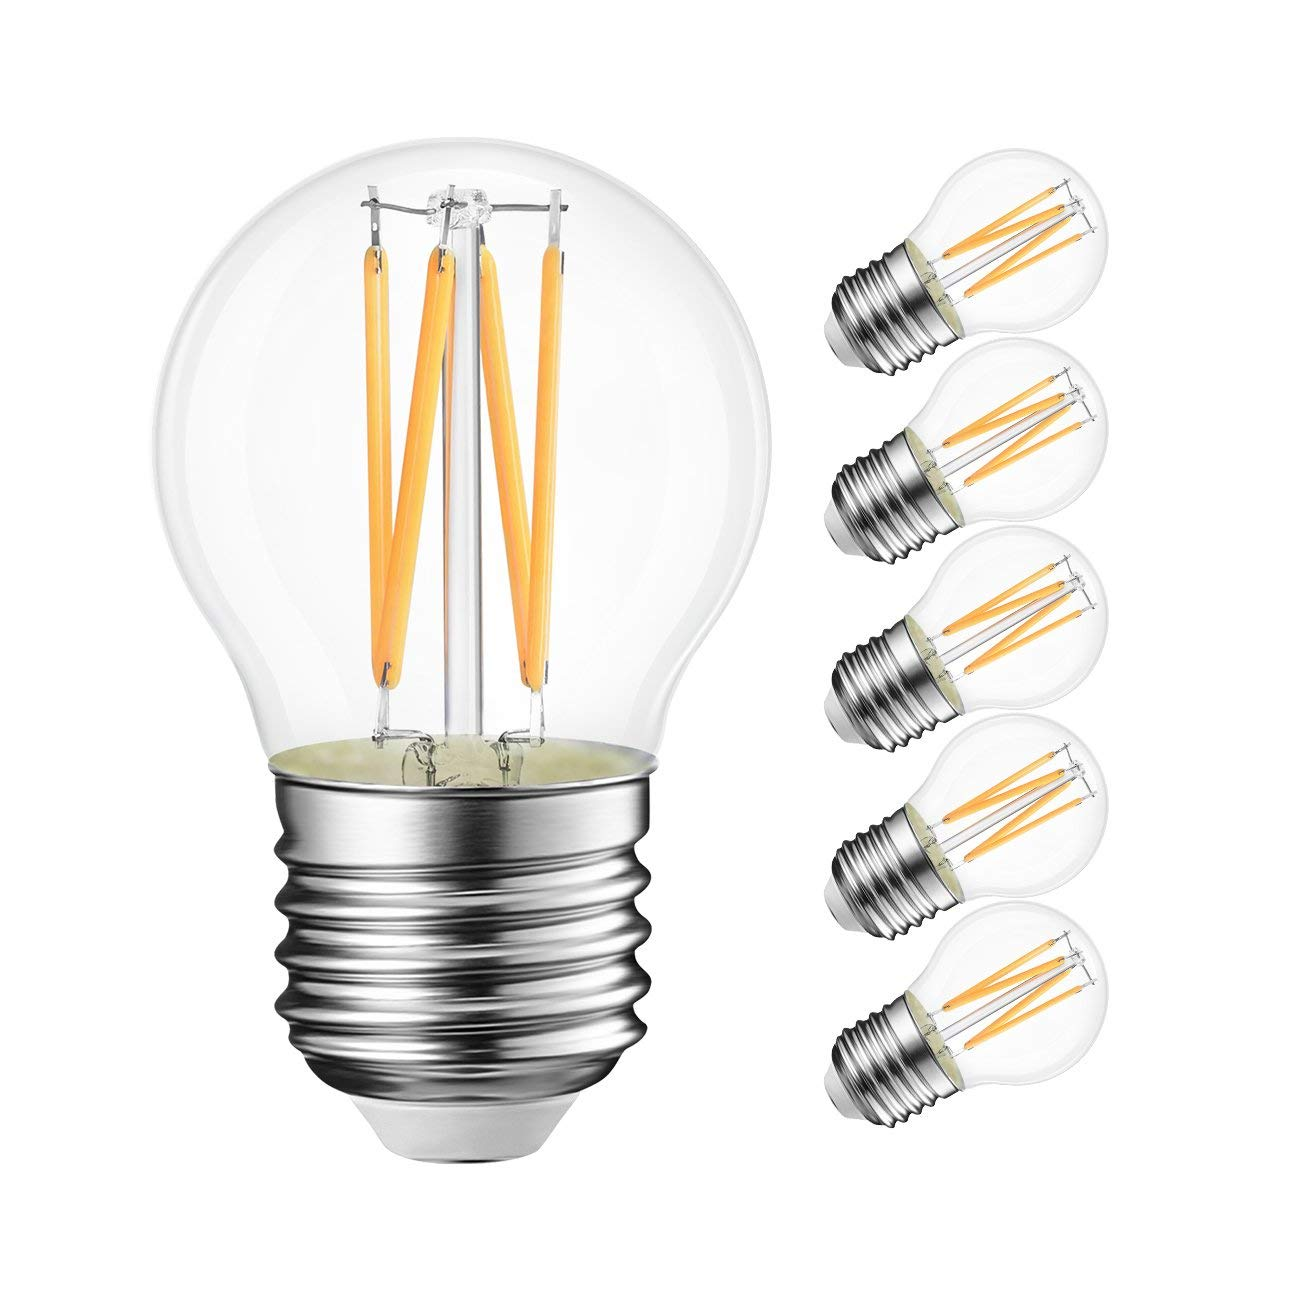 Stupendous E14 Light Bulb Socket Wiring Lifx Led Night Wiring Cloud Nuvitbieswglorg